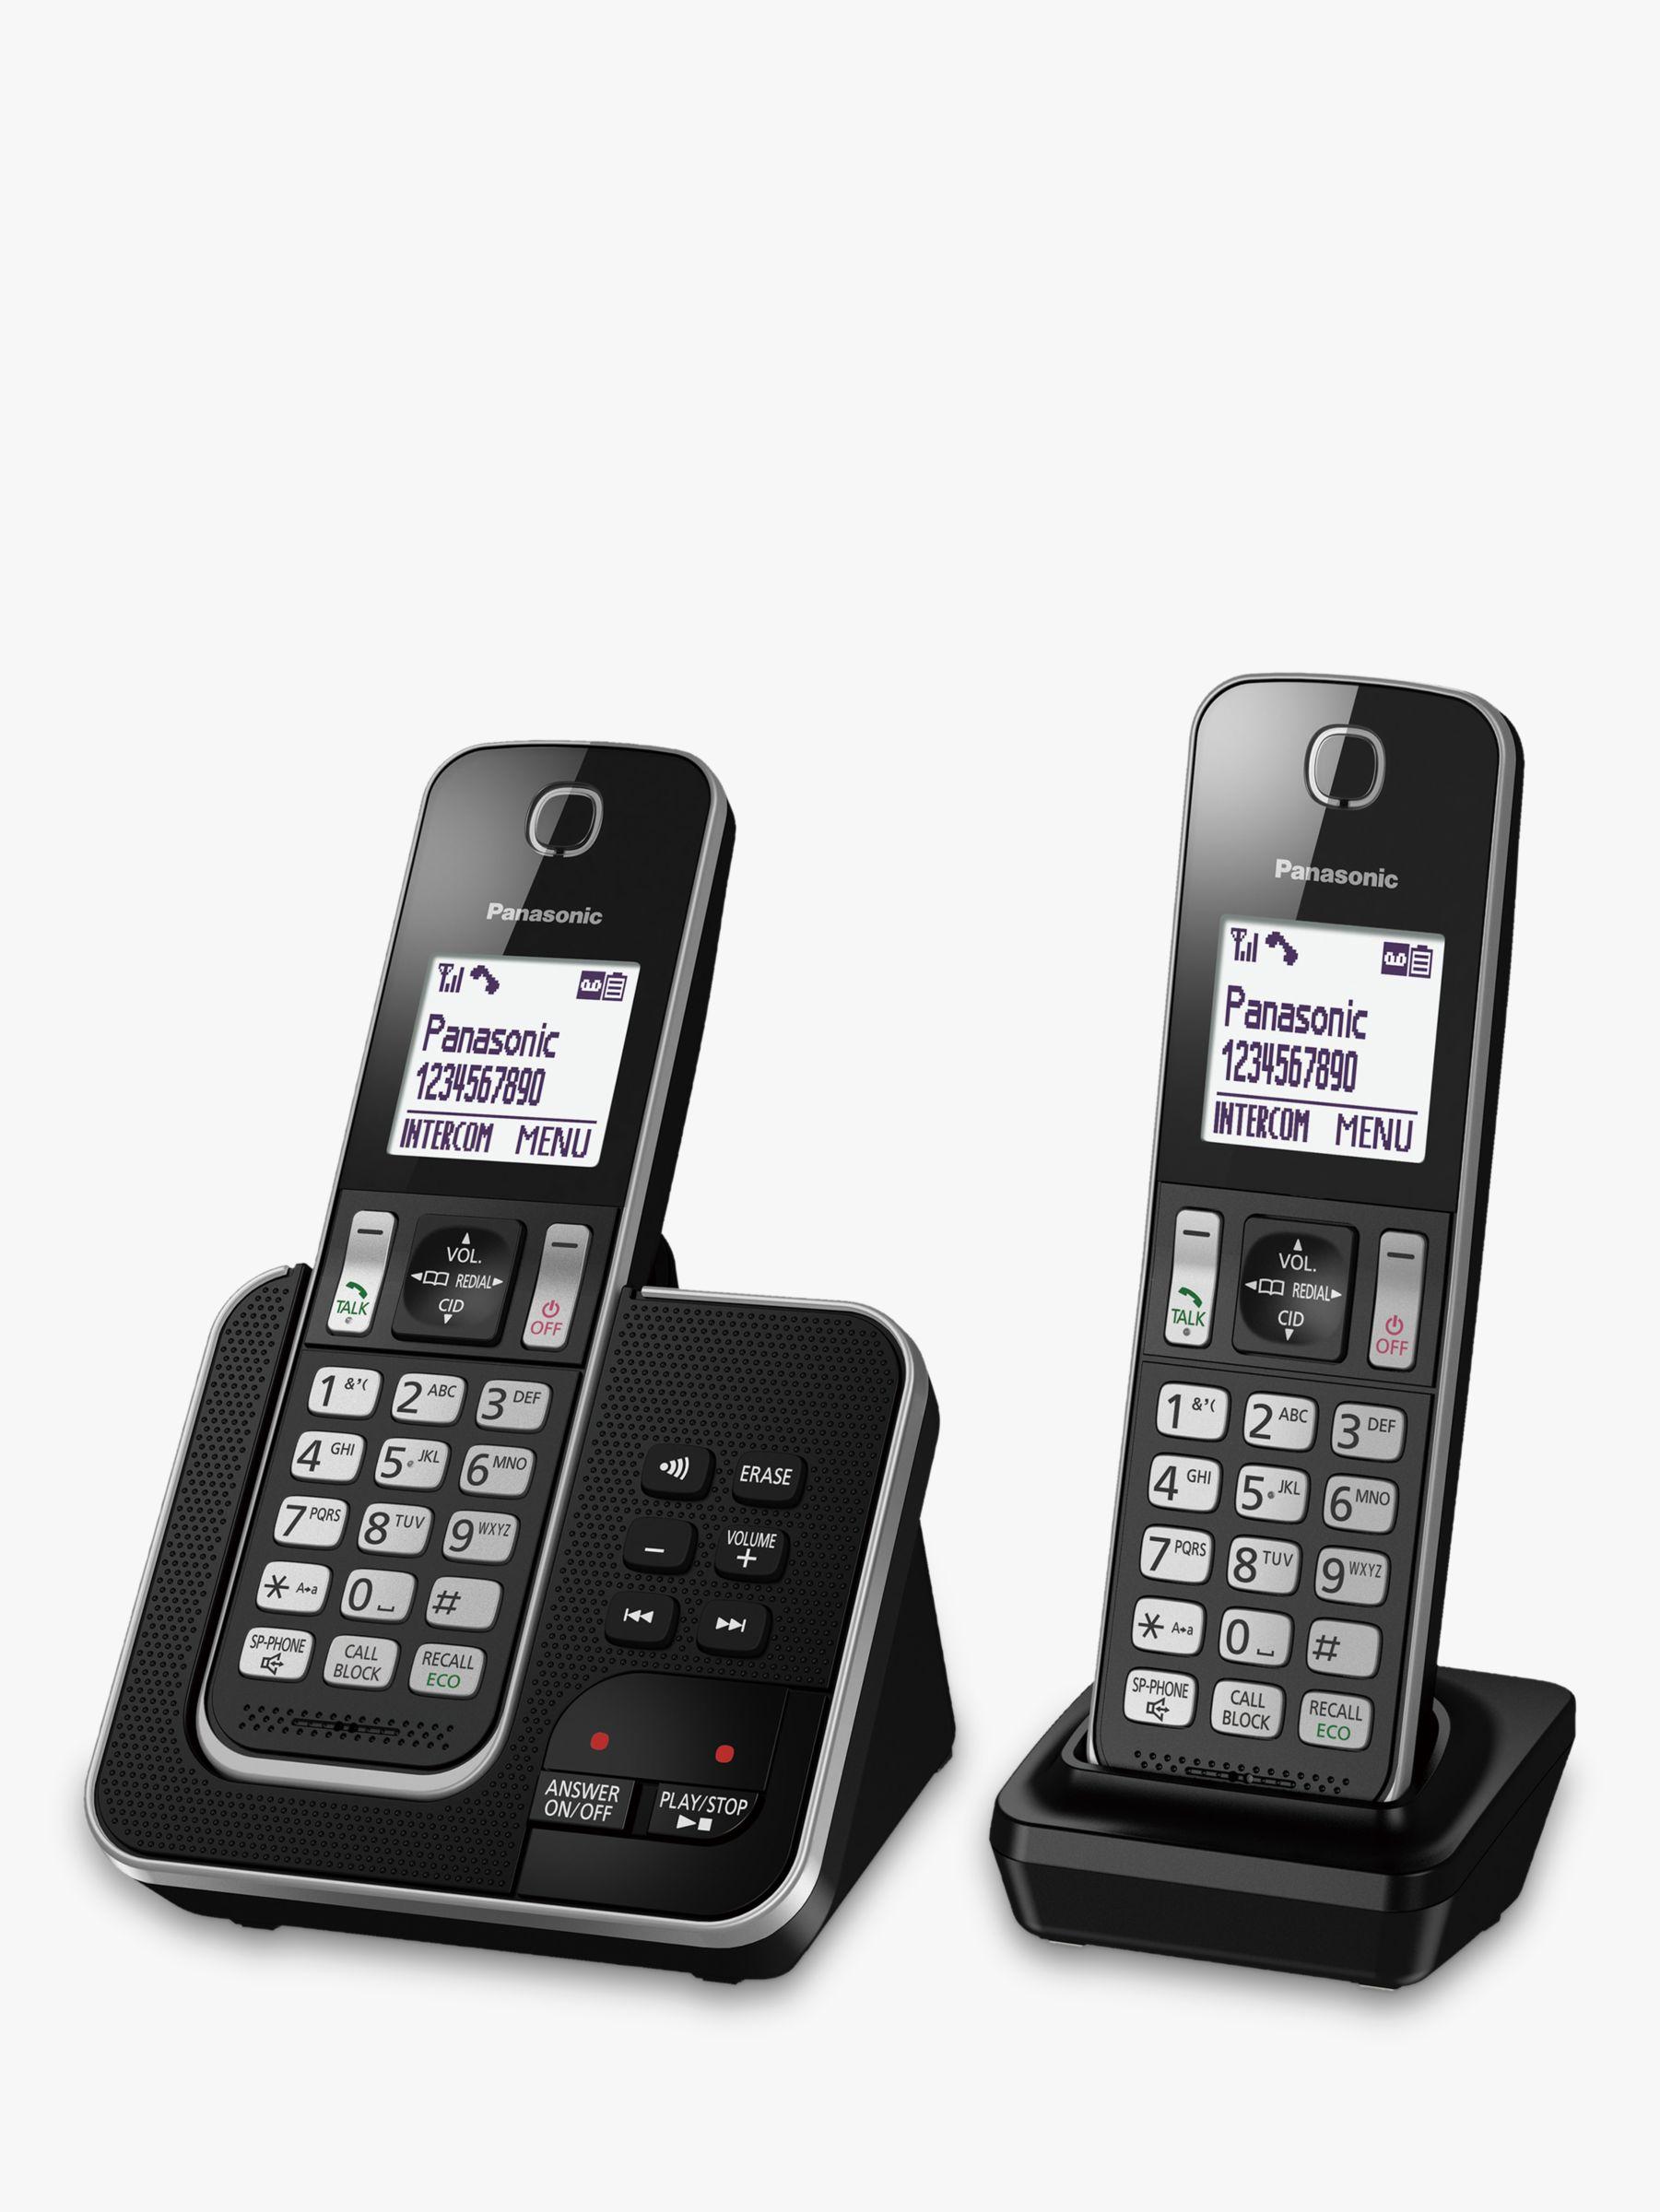 Panasonic Panasonic KX-TGD622EB Digital Cordless Telephone with Dedicated Nuisance Call Block Button and Answering Machine, Twin DECT